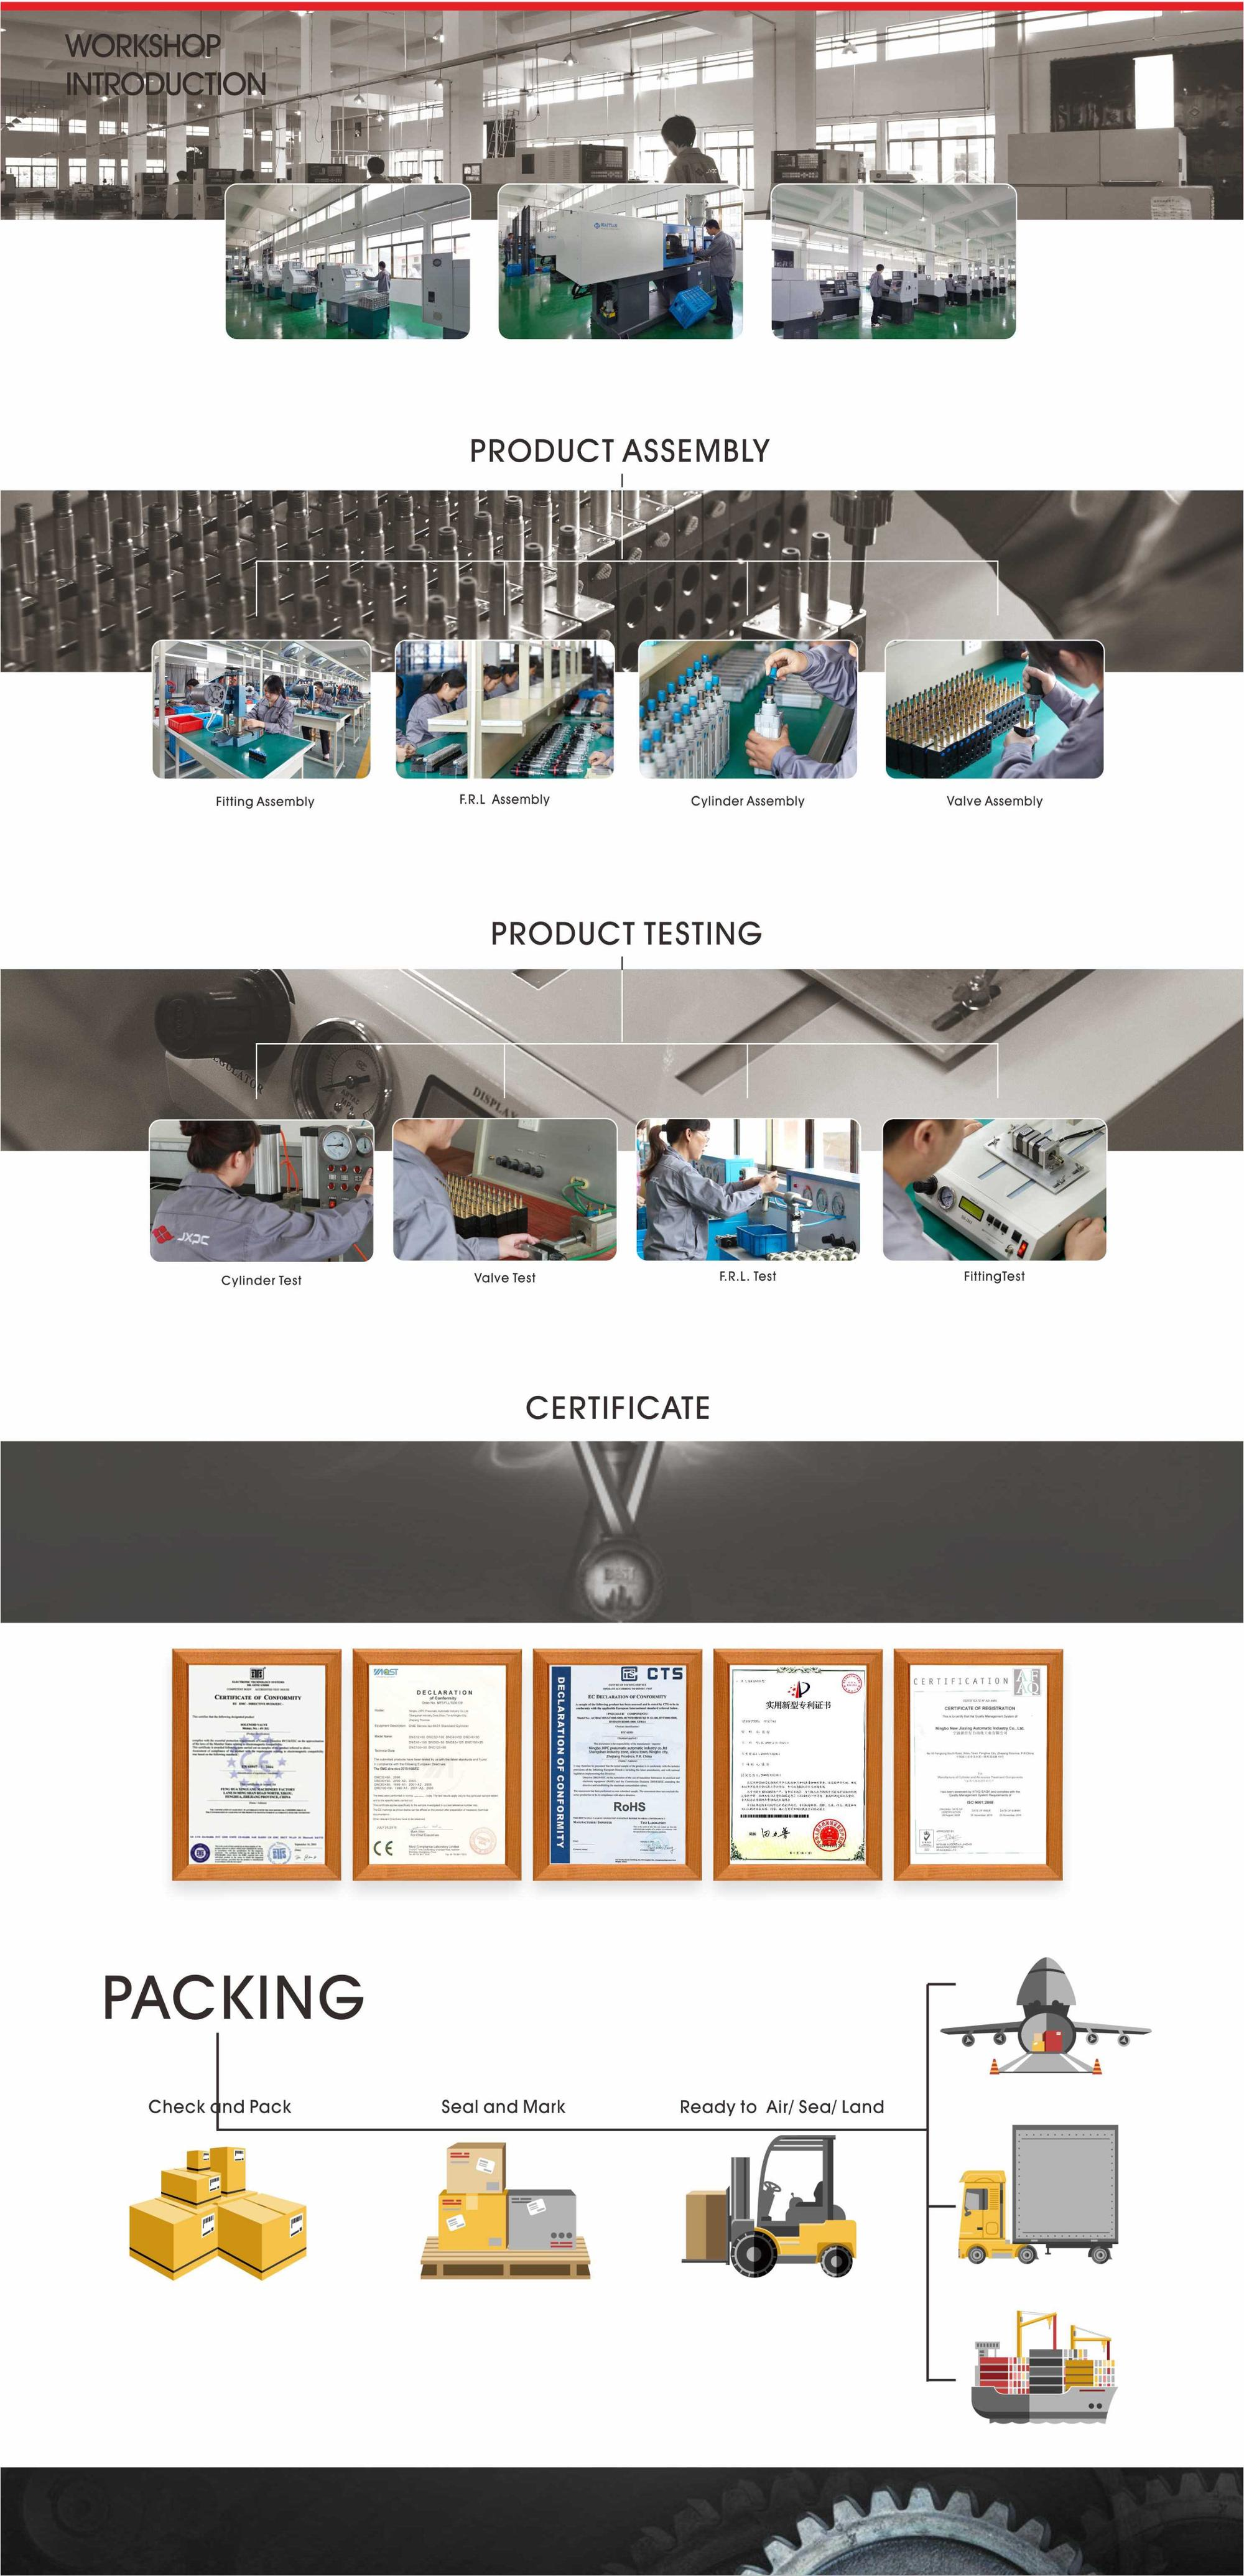 hight resolution of airtac type 4v210 06 4v210 08 5 2 way solenoid valve wiring diagram pneumatic